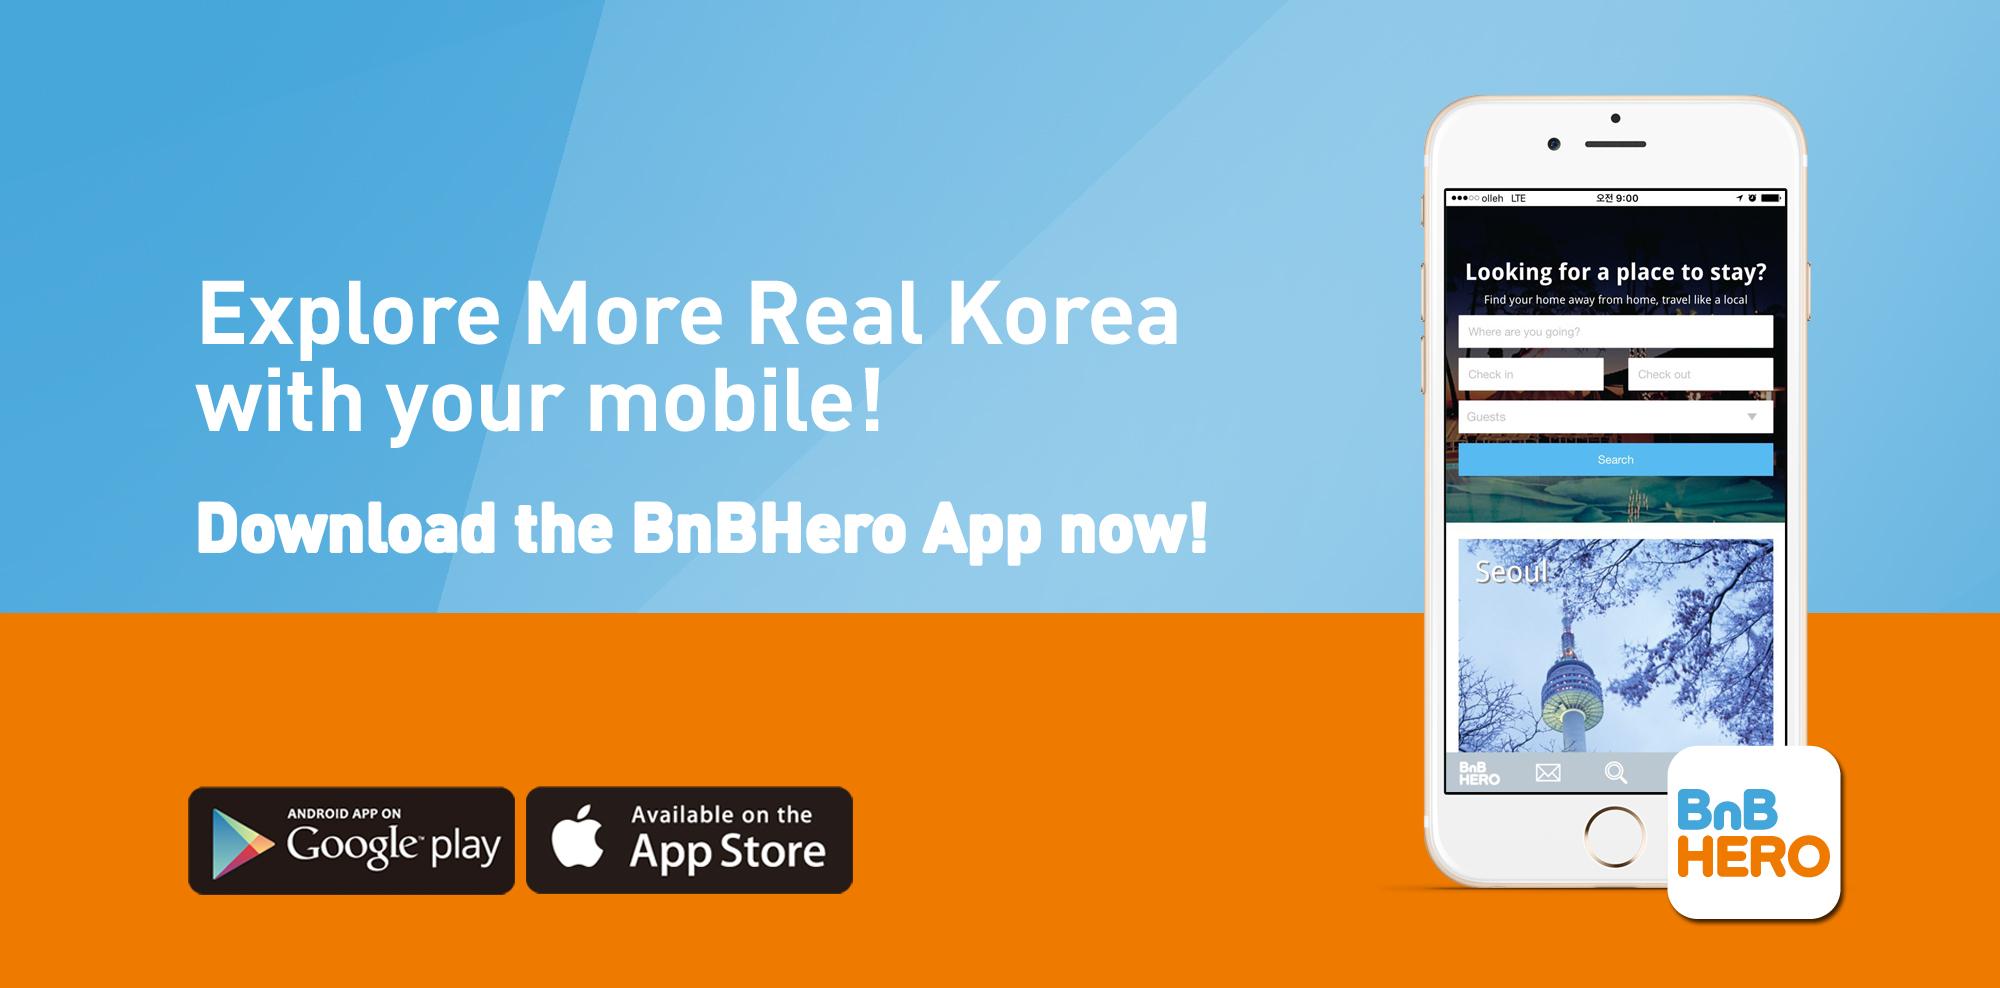 BNBHERO APP has released!! - TripToday